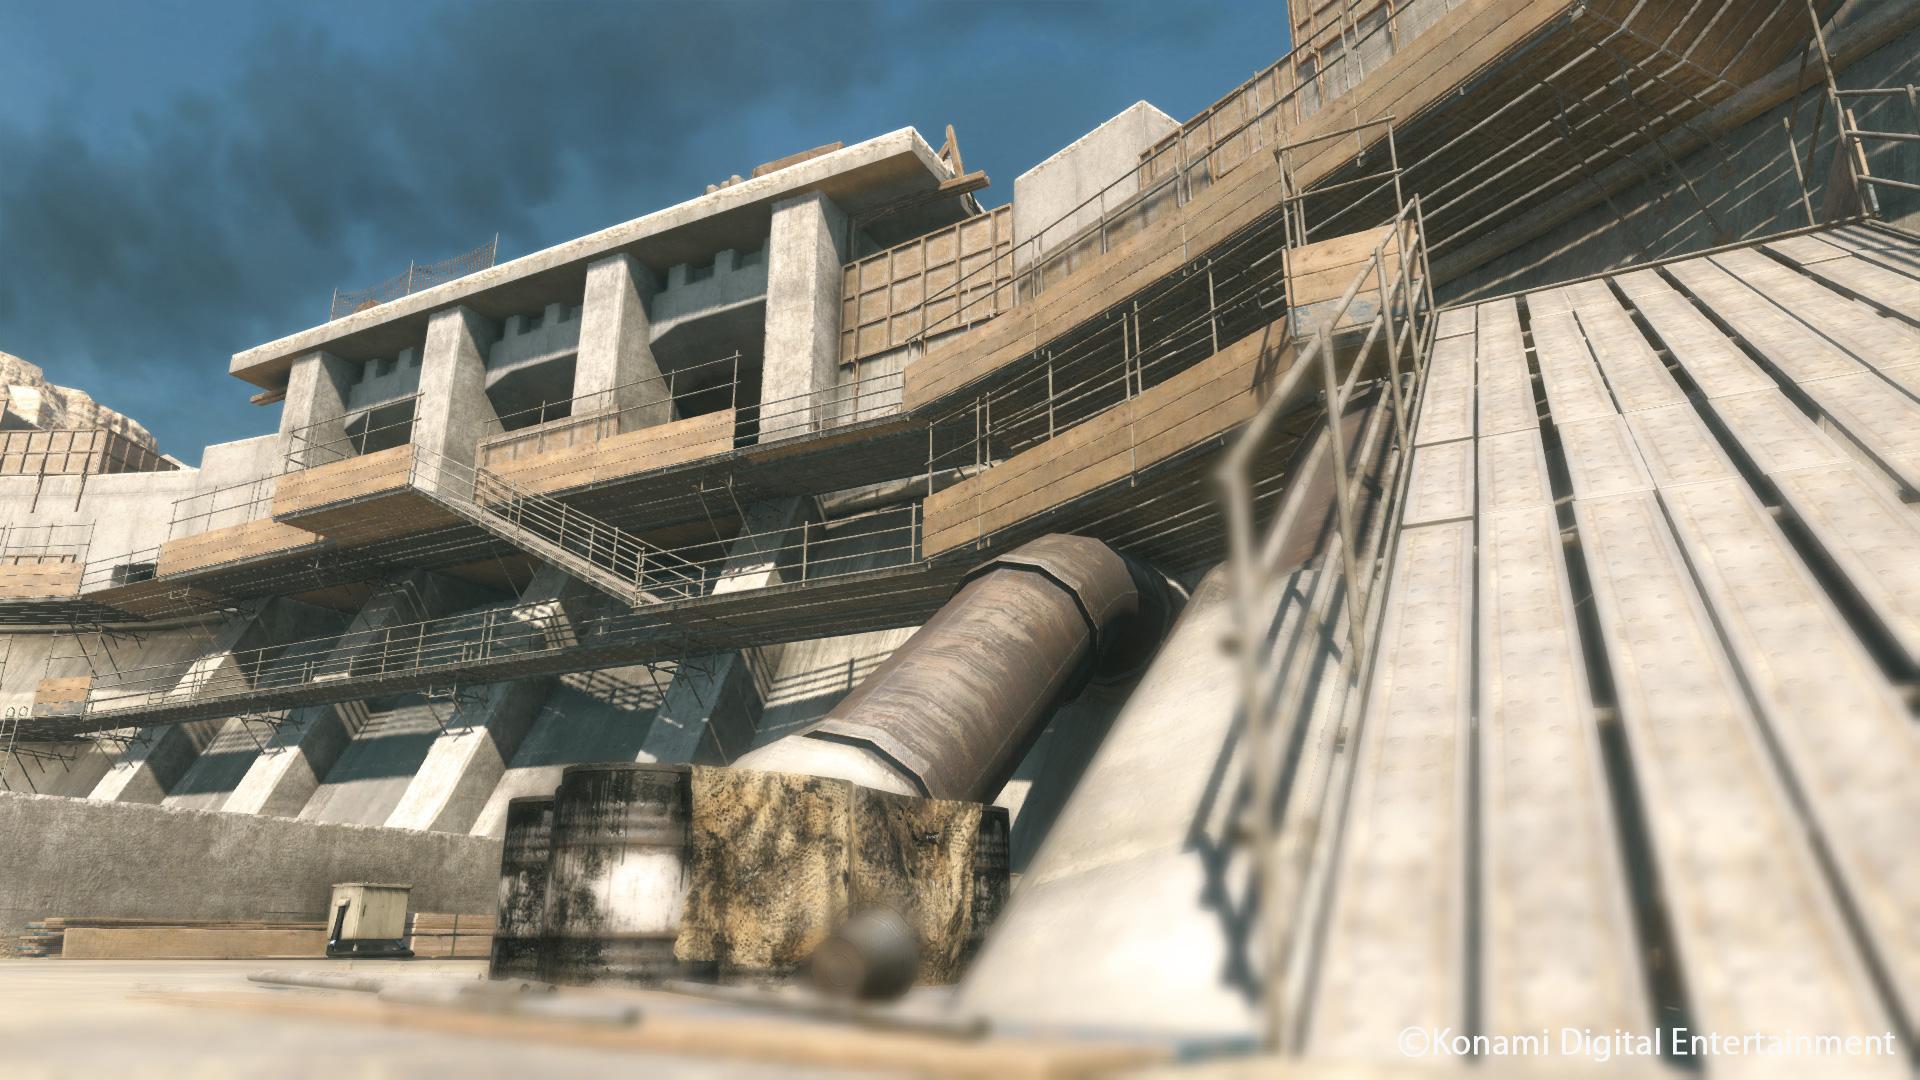 Metal-Gear-Online-Screen-20